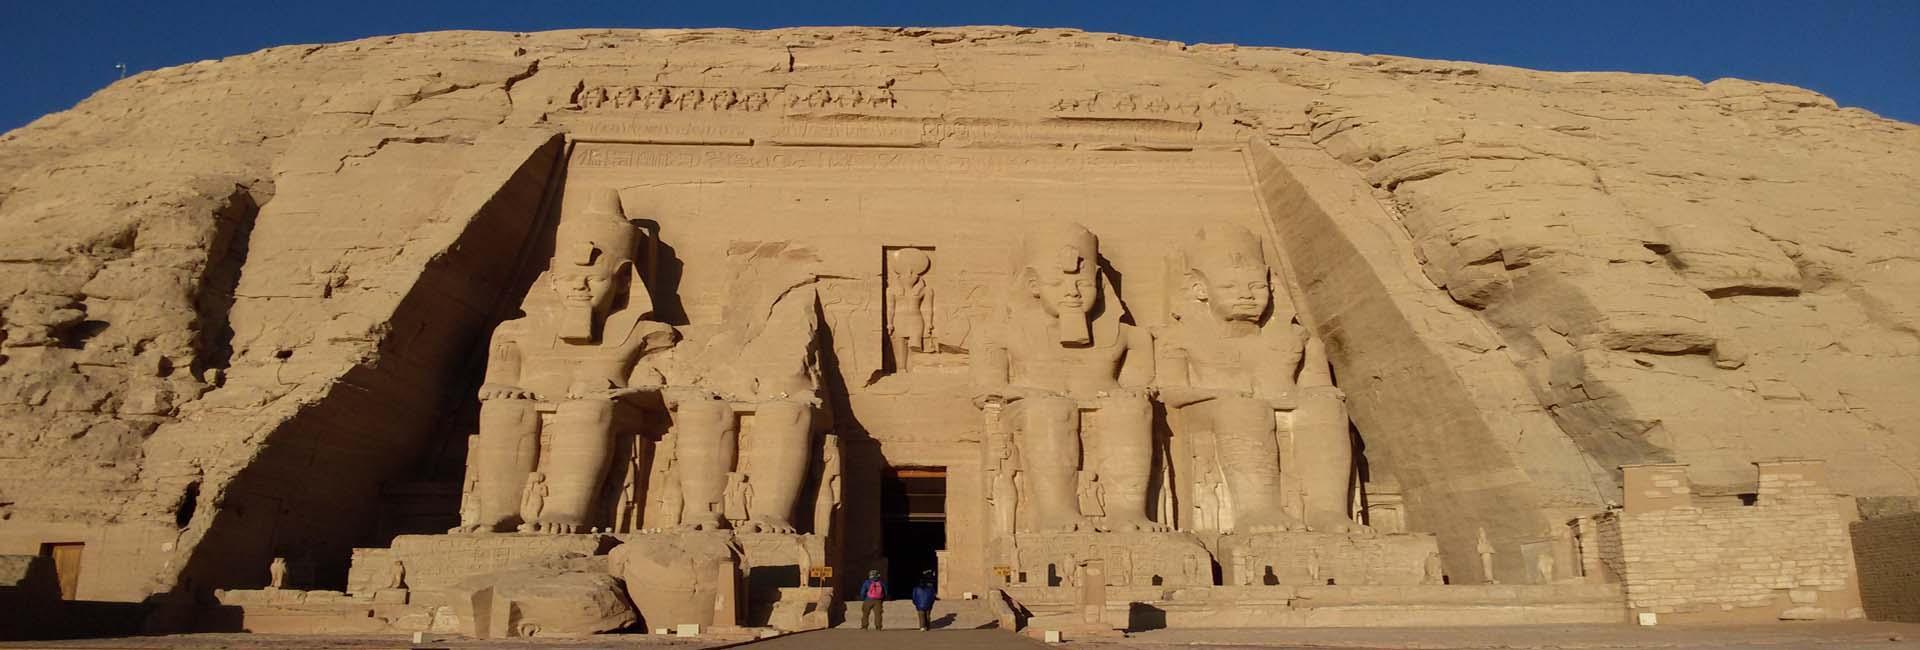 Luxor and Abu Simbel tour